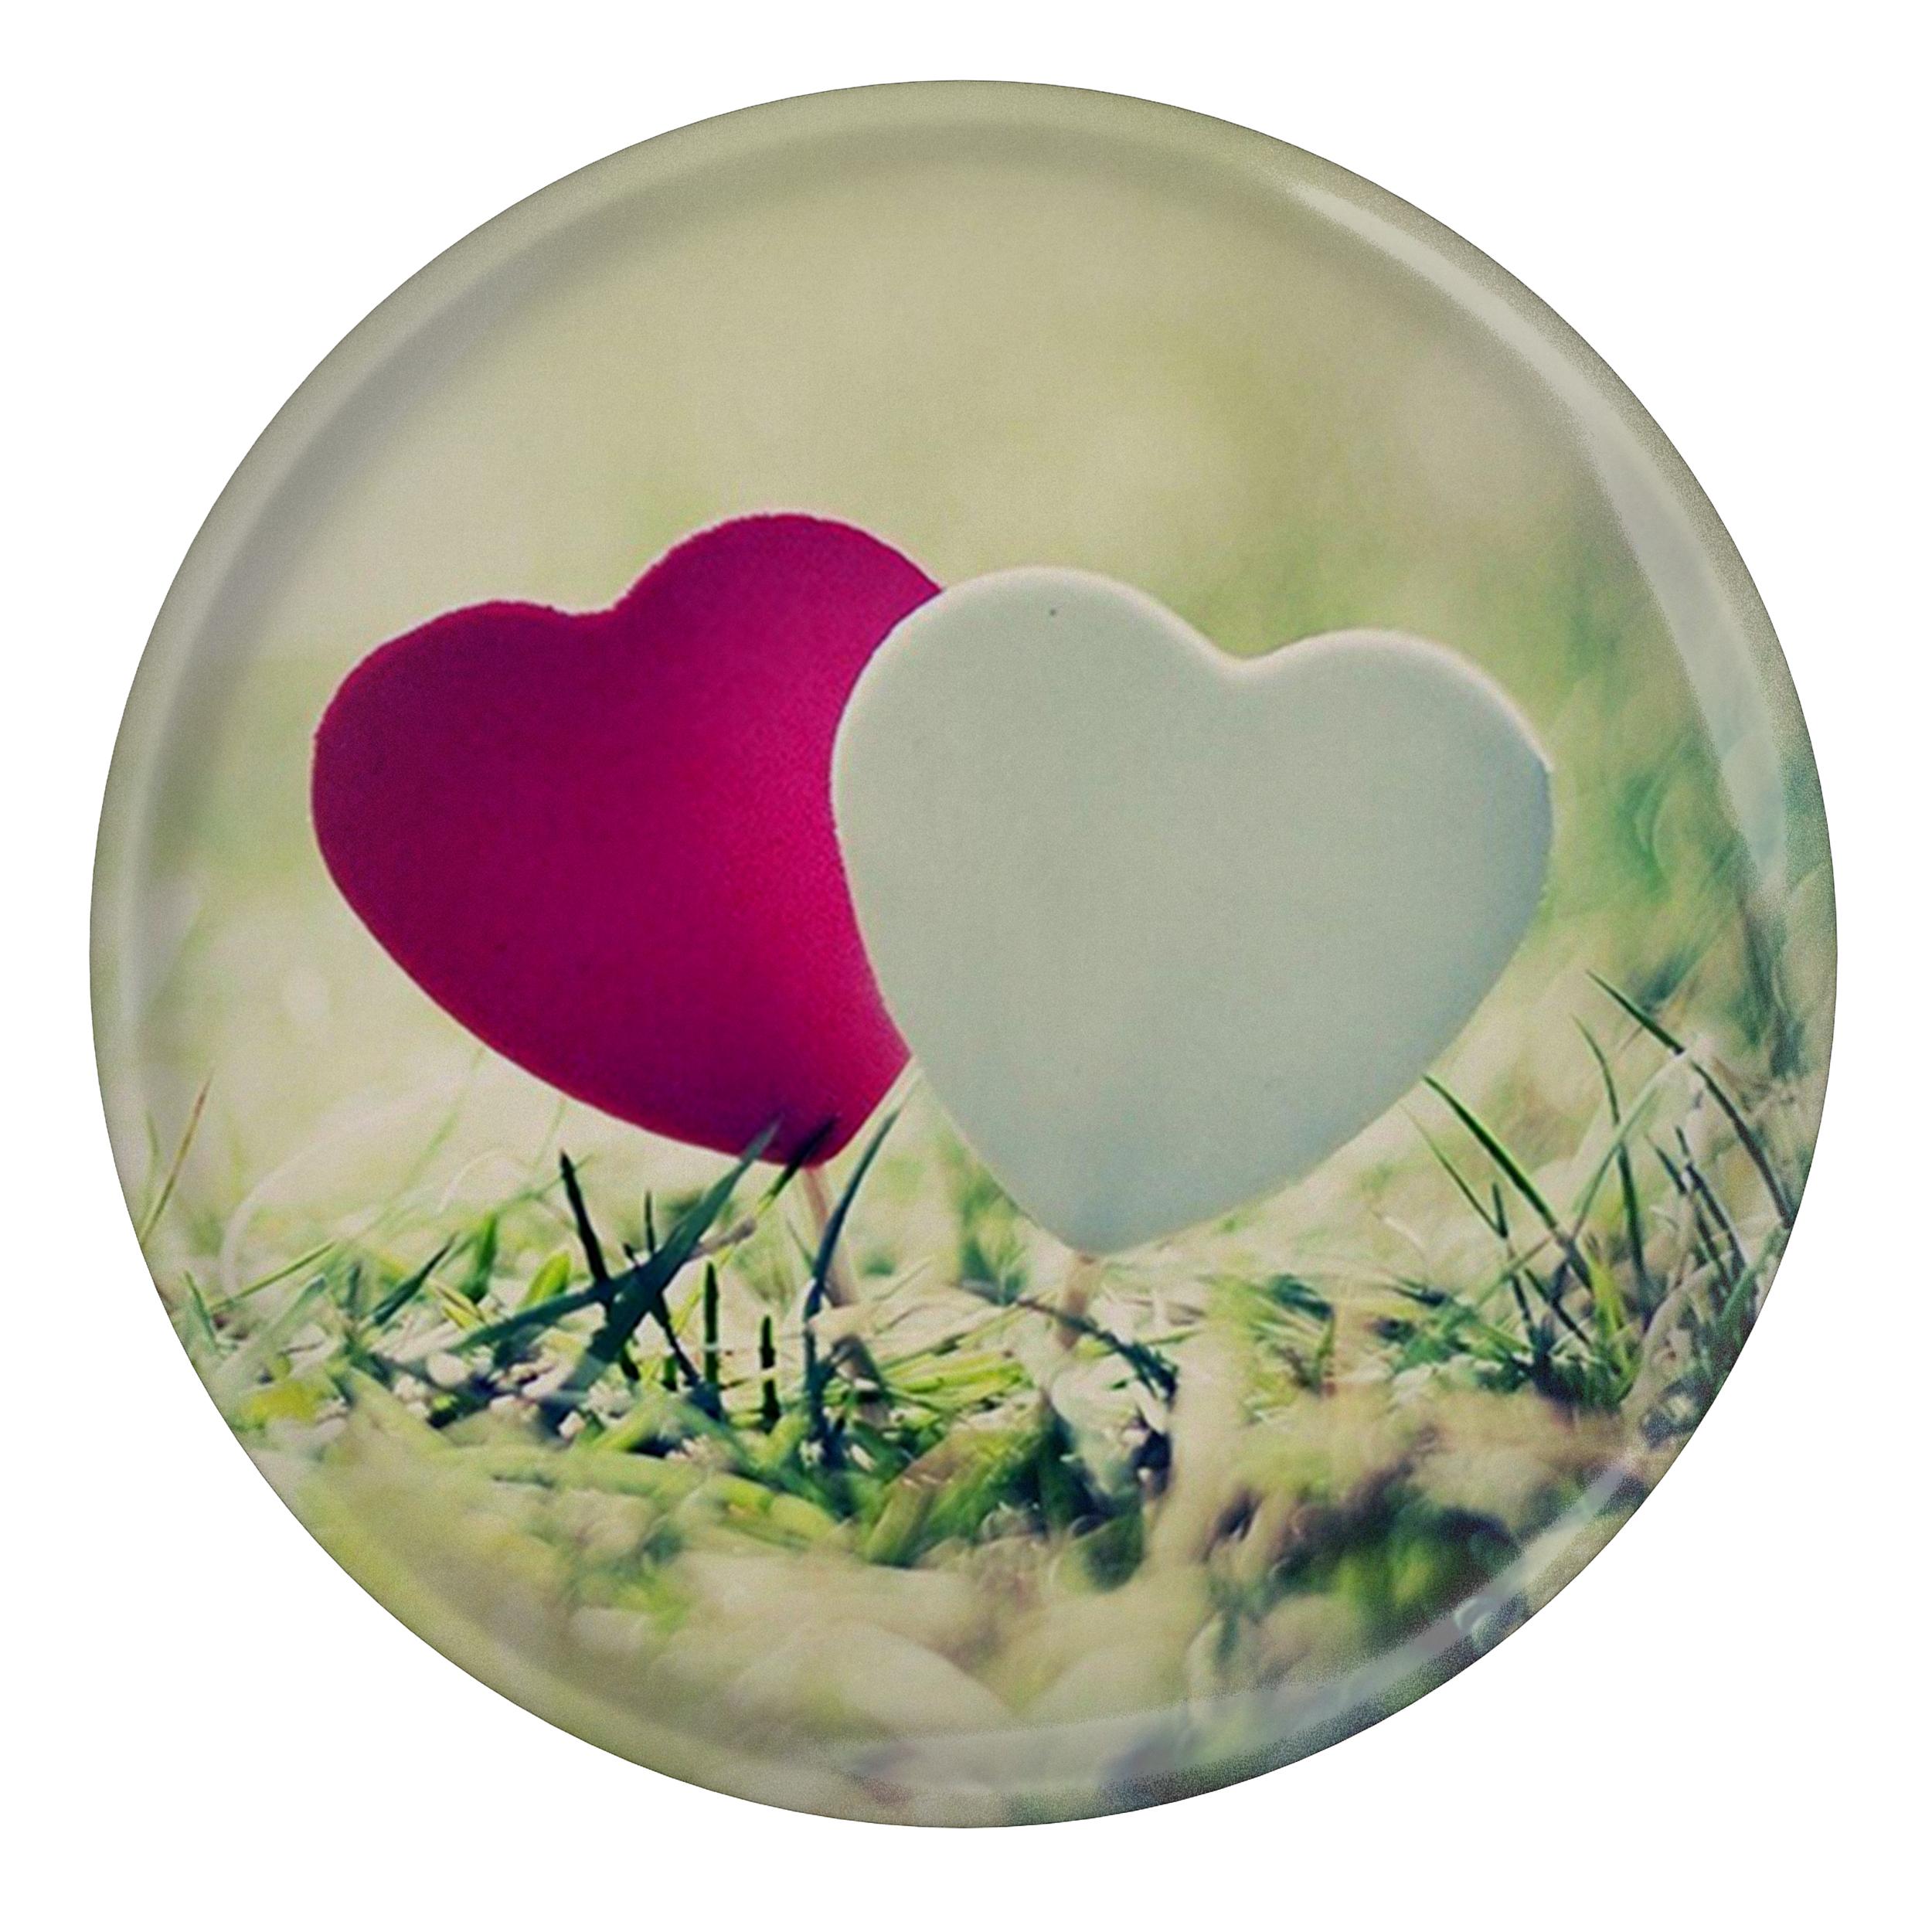 پیکسل طرح قلب و عشق مدل S3096